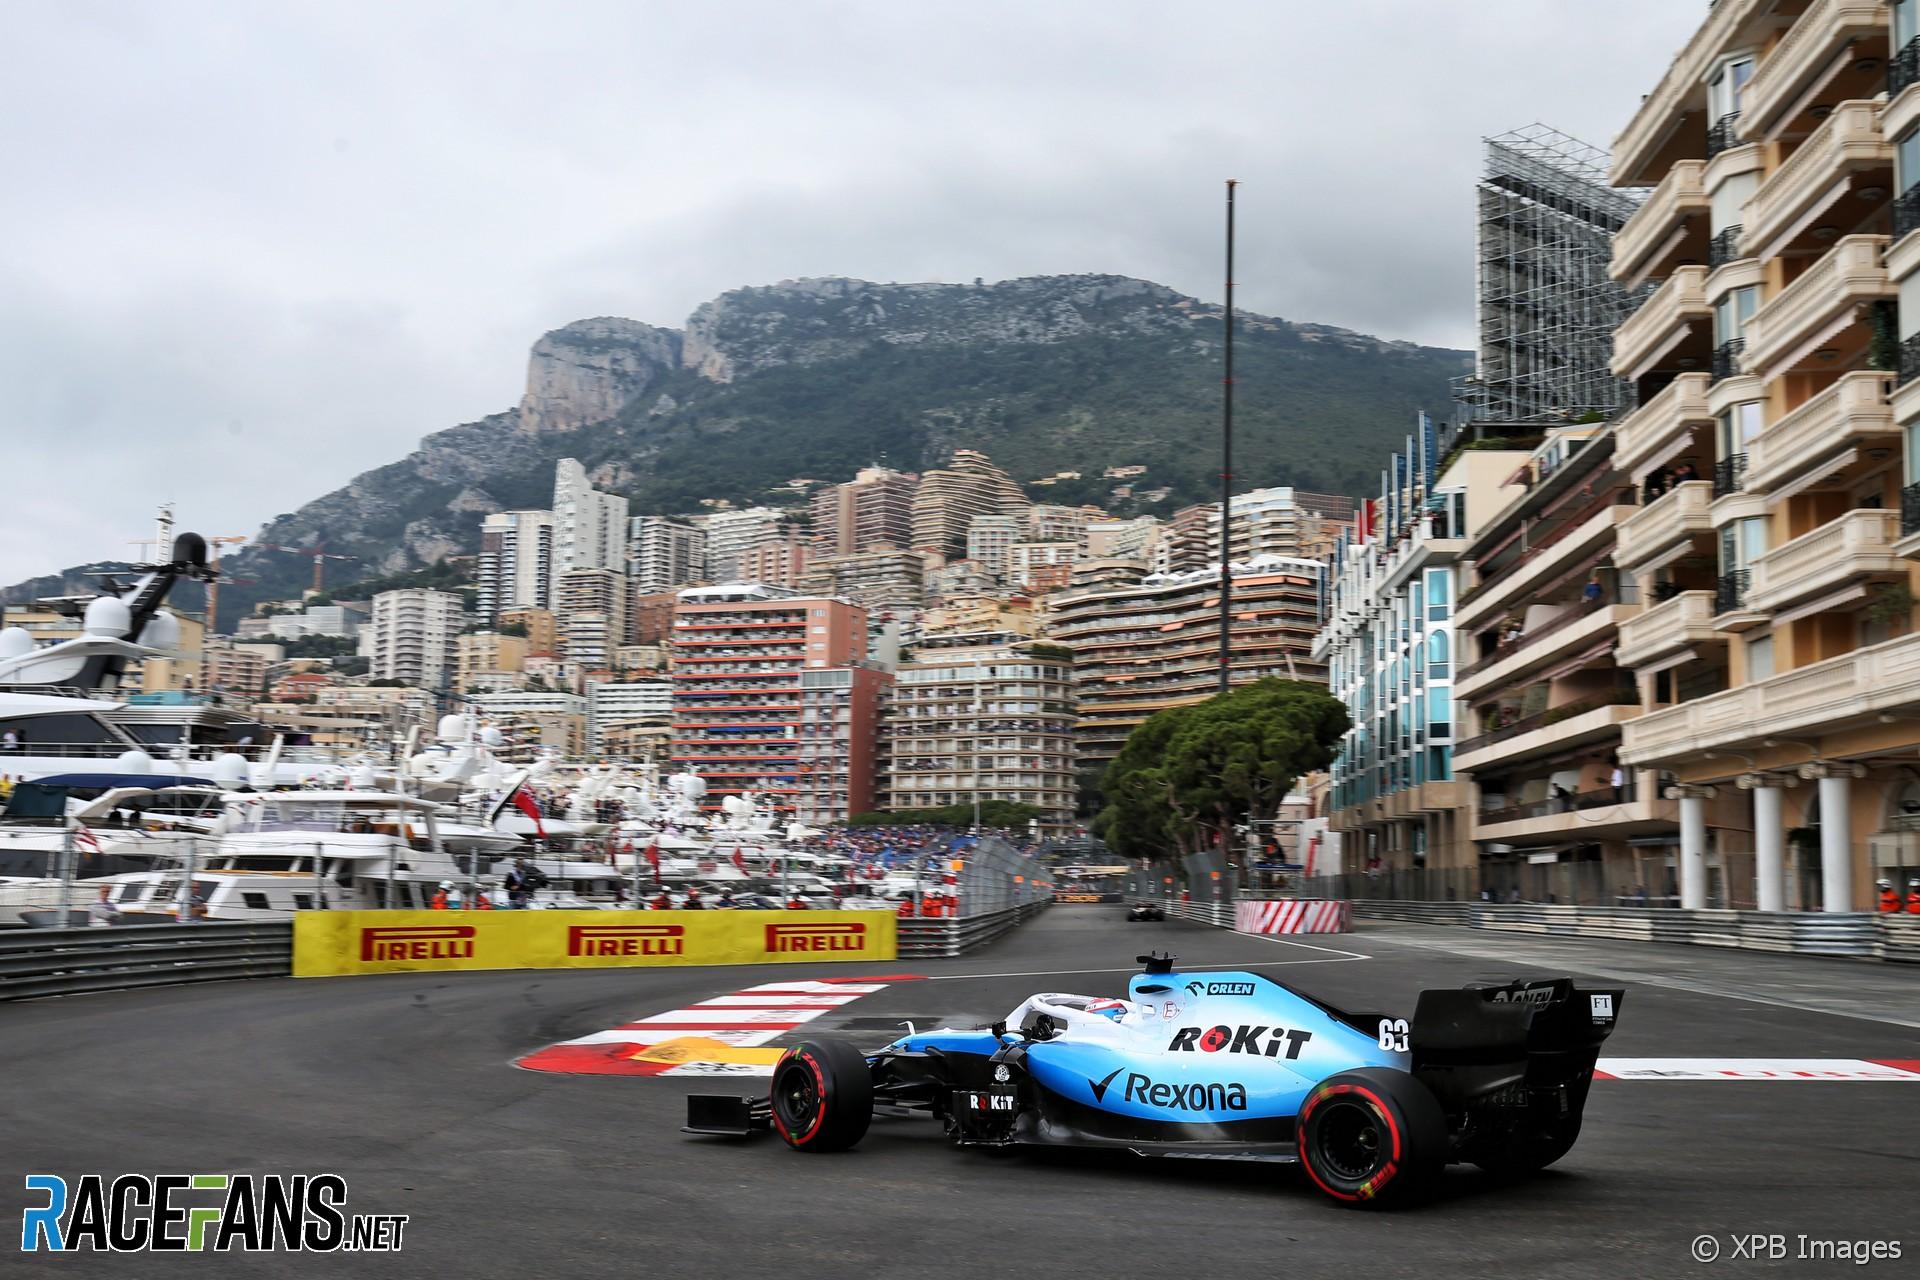 George Russell, Williams, Monaco, 2019